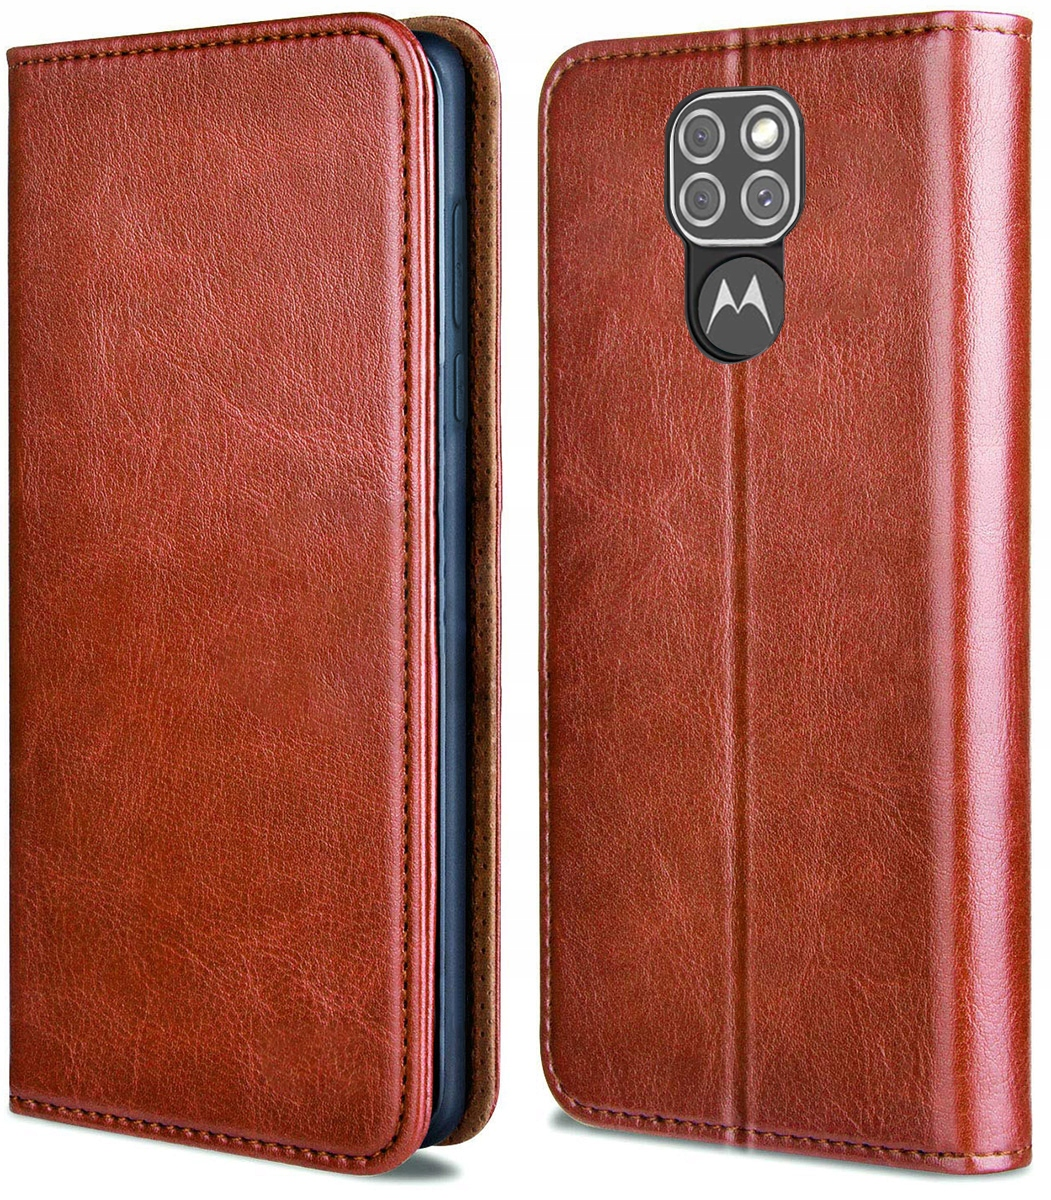 Etui do Motorola Moto G9 Play Skórzane Case Szkło